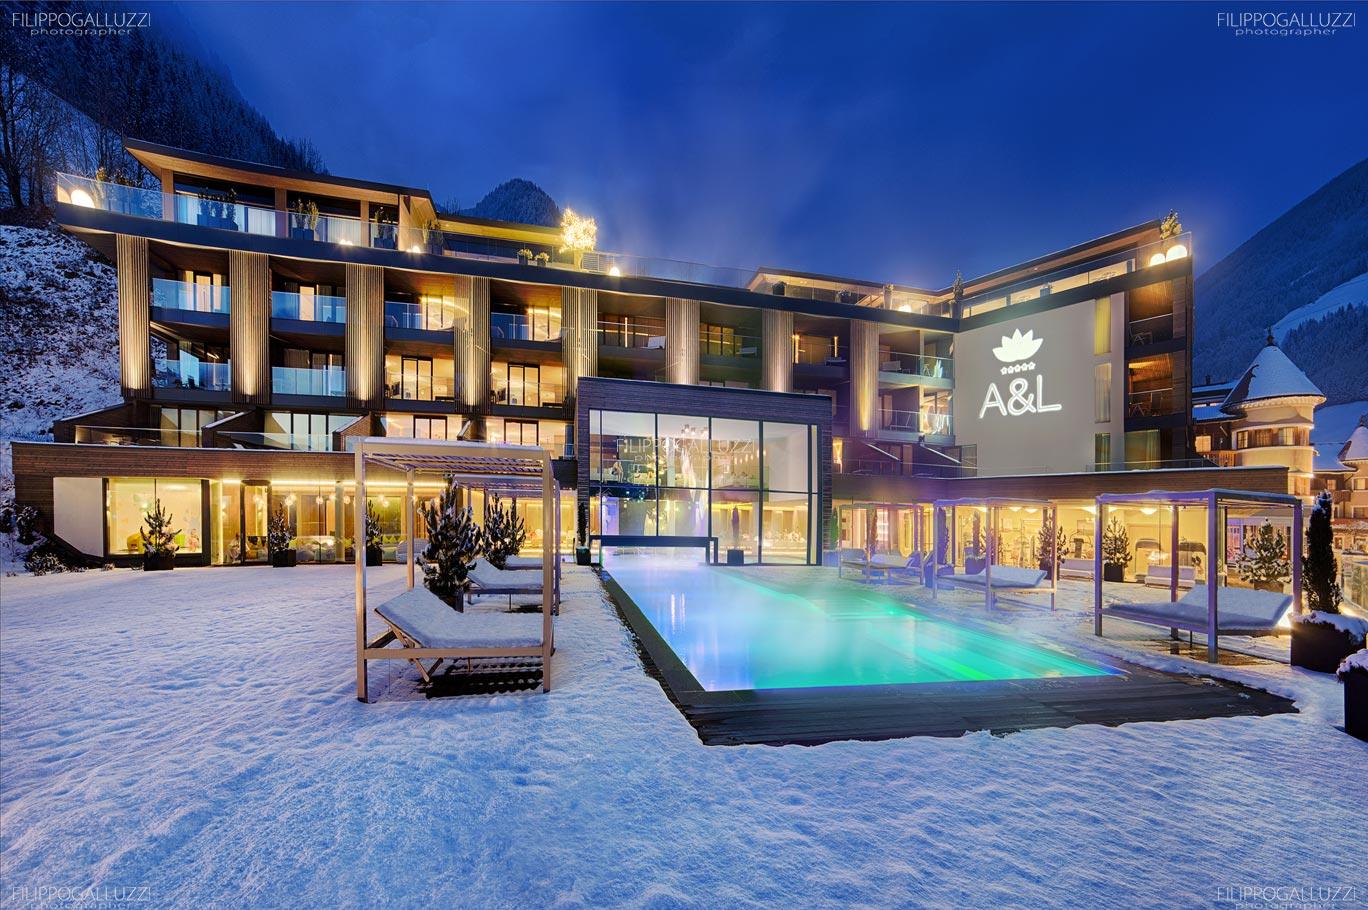 Fotografia Hotel Wellnes exterior Alpenschloessl & Linderhof Ahrntal